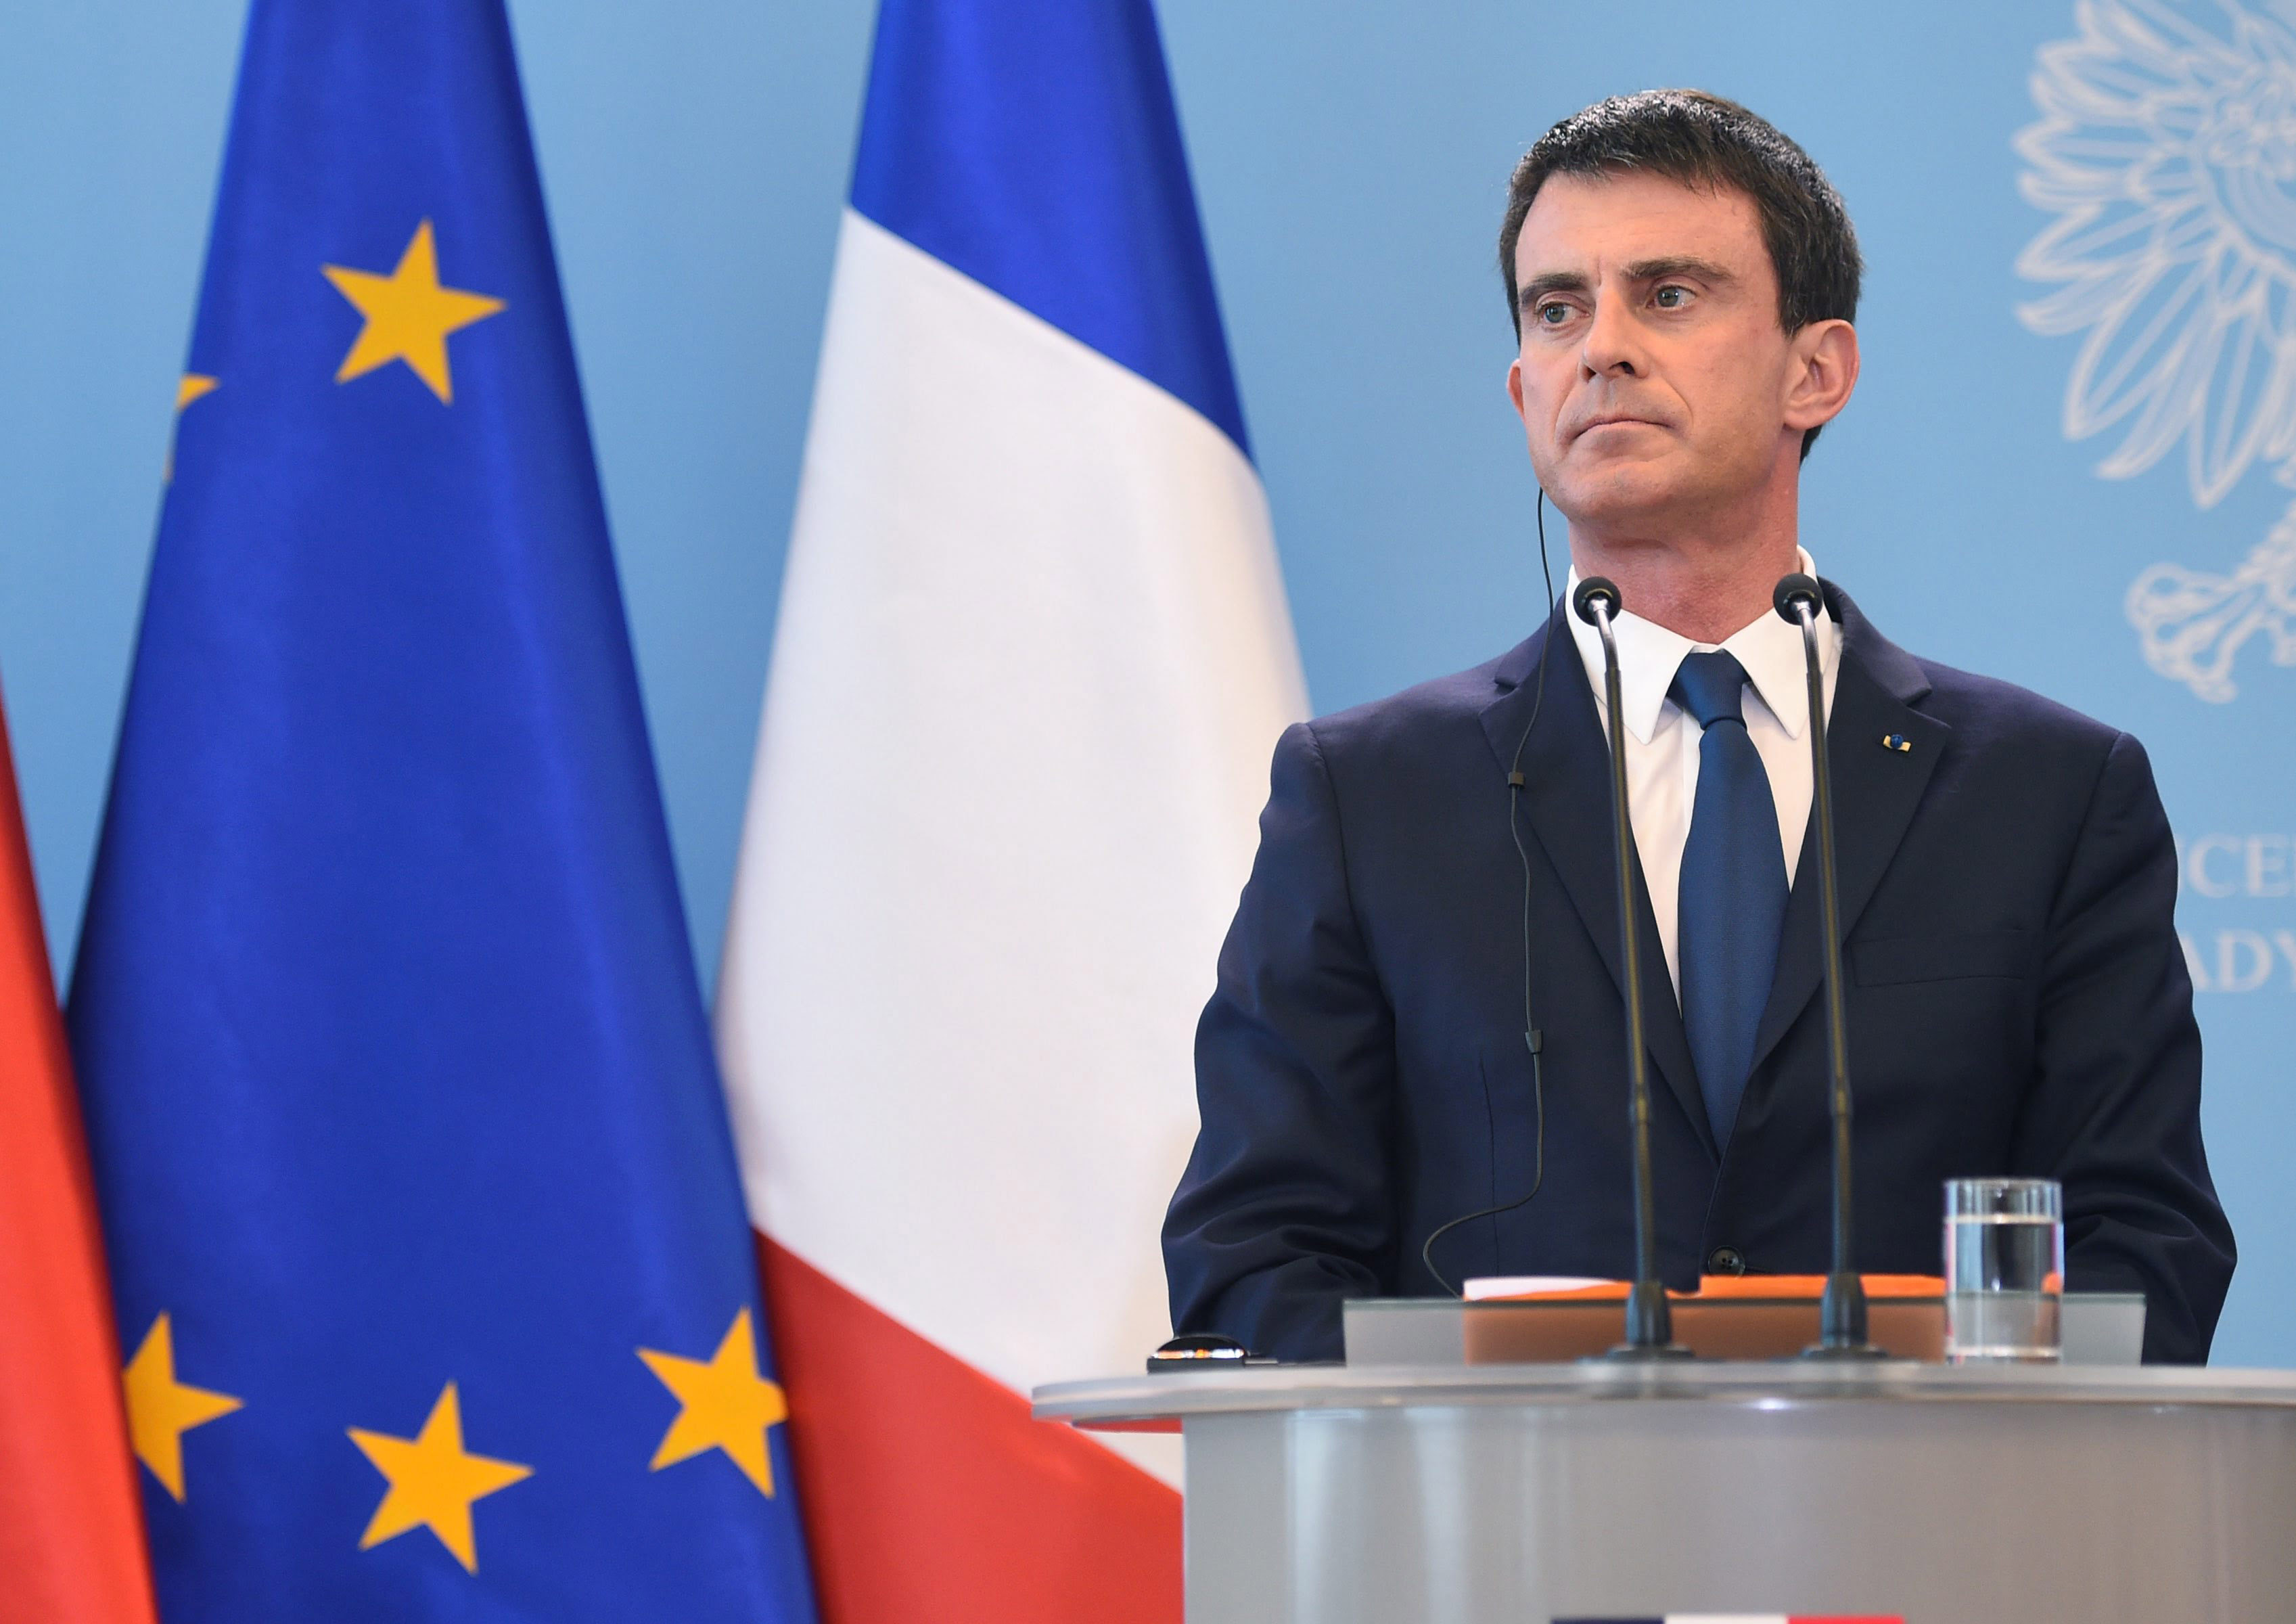 Risultati immagini per Manuel Valls